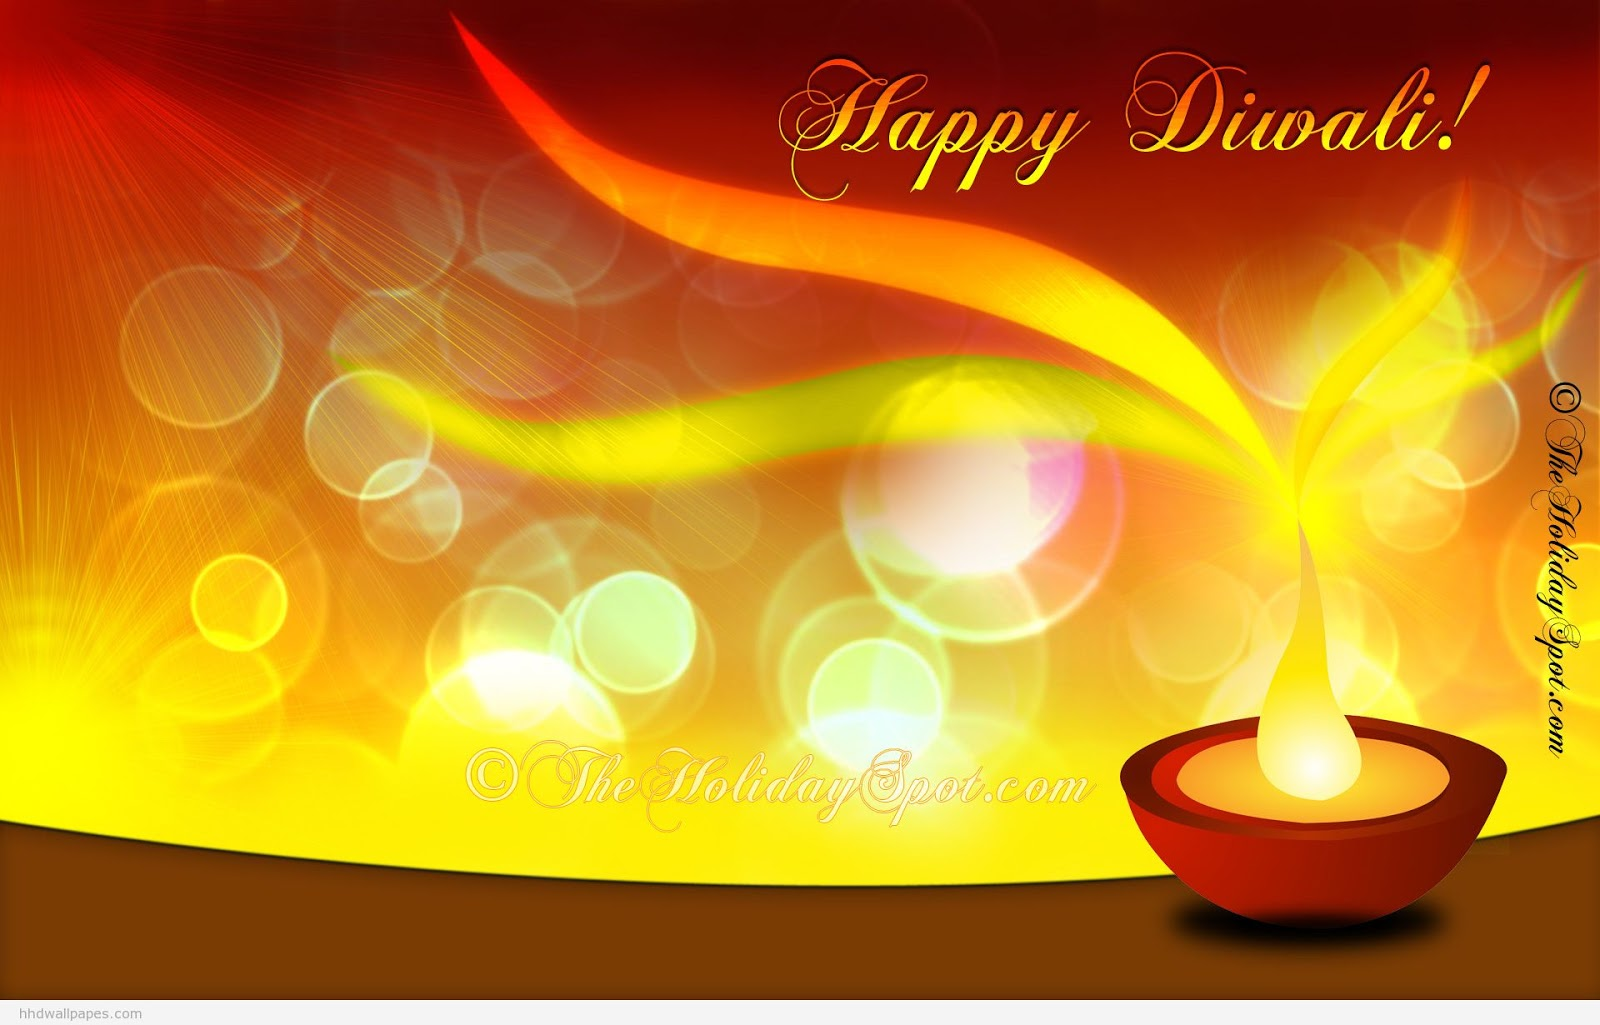 http://3.bp.blogspot.com/-oSpoHJknIDo/UI51GiYa1xI/AAAAAAAABgw/YJ0HNWqPG3w/s1600/1920x1200-HD-Happy-Diwali-2012-Wallpaper-8.jpg